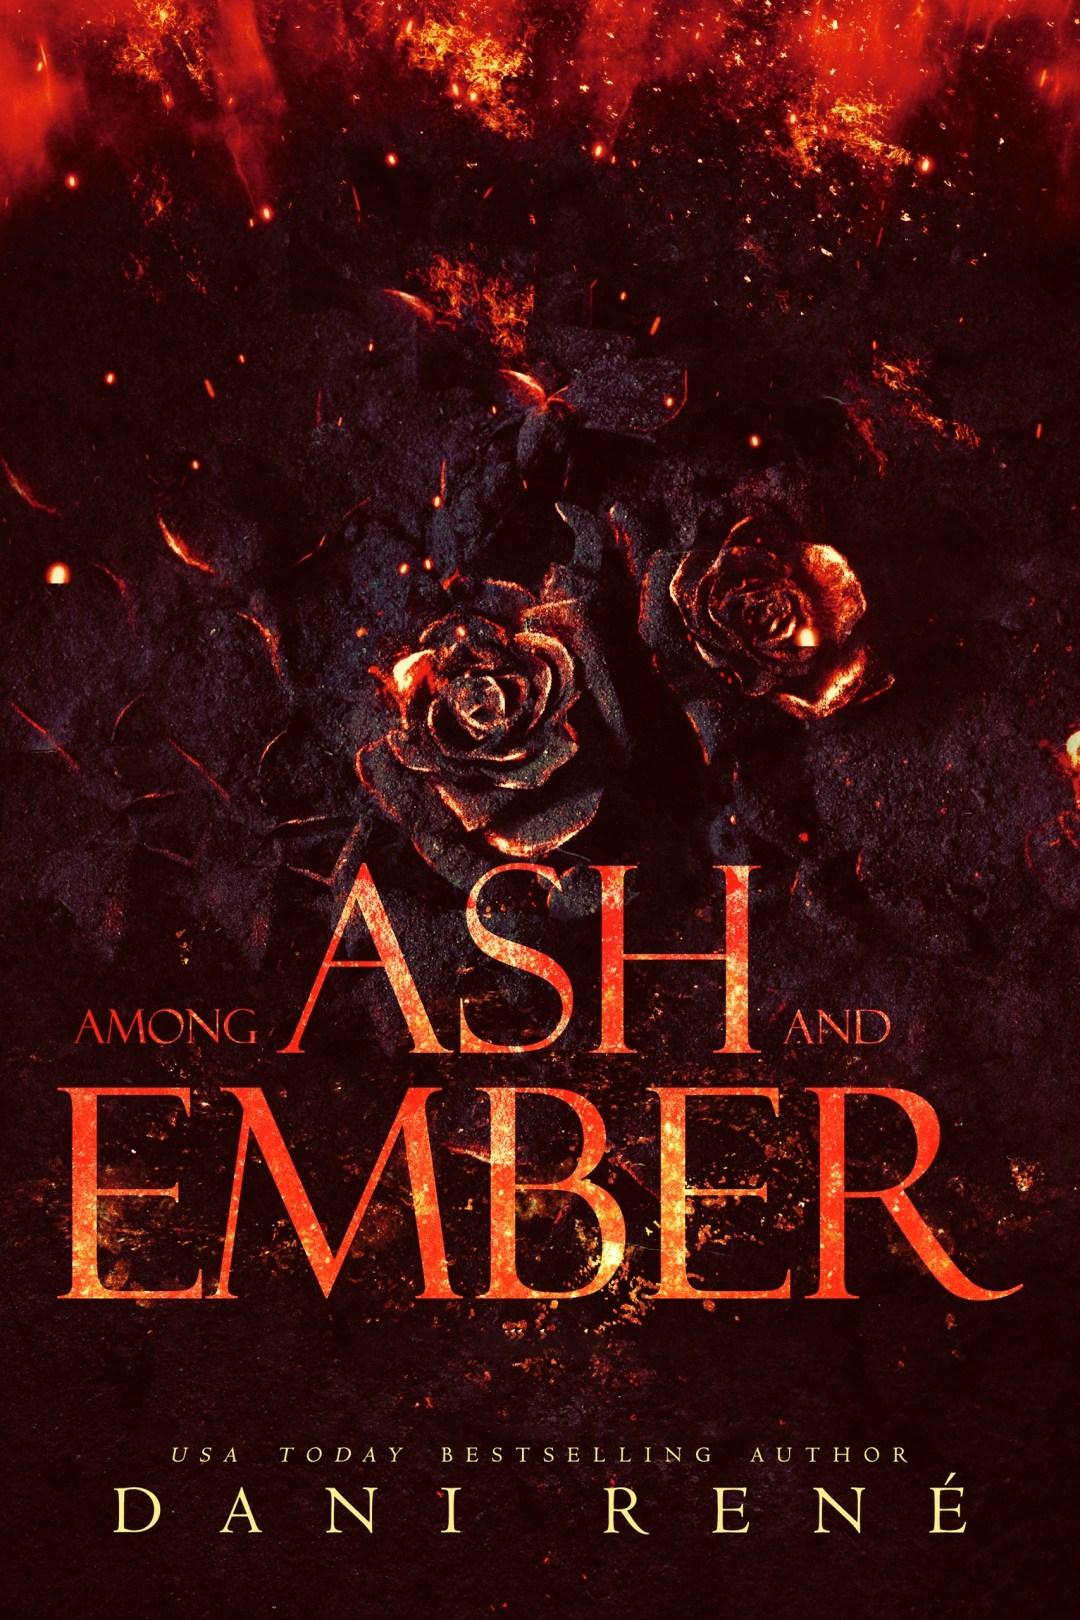 Among Ash and Ember Cover